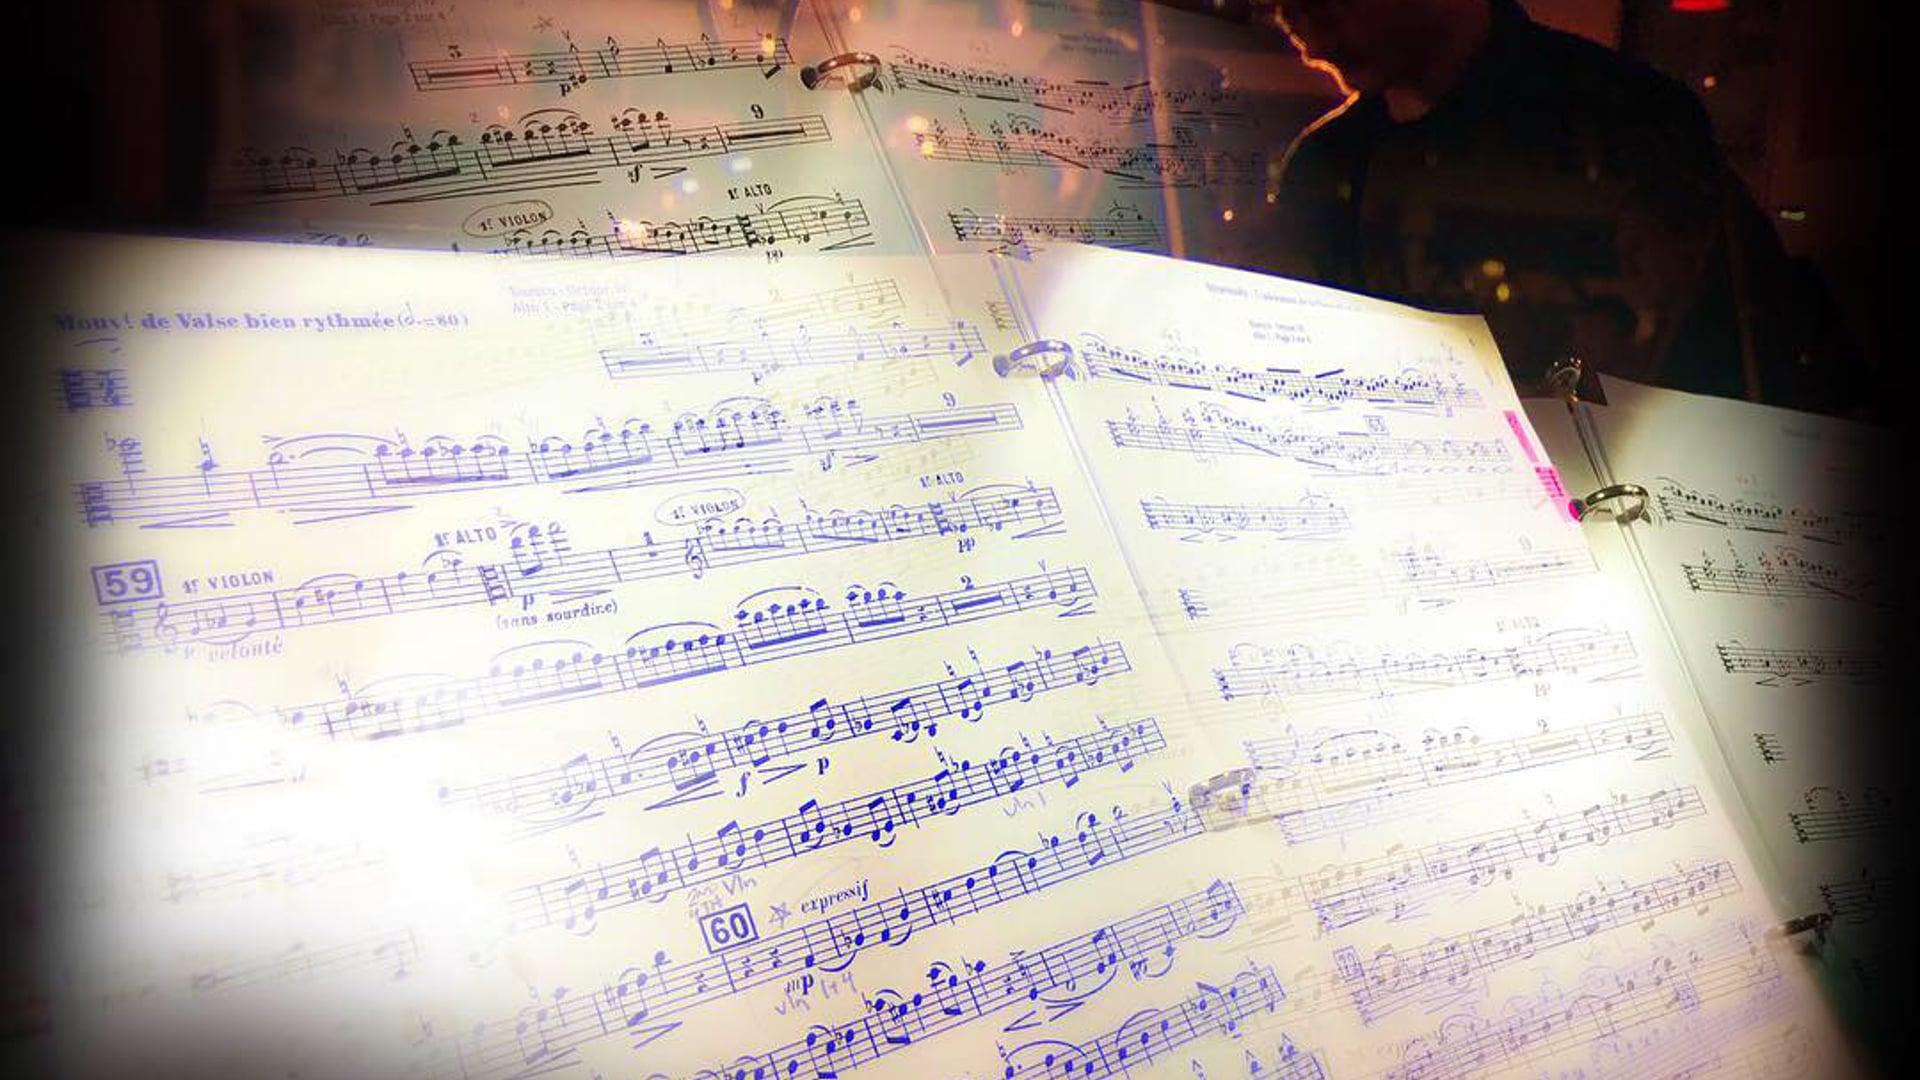 collectif9 - 07 - Luciano Berio - Sinfonia